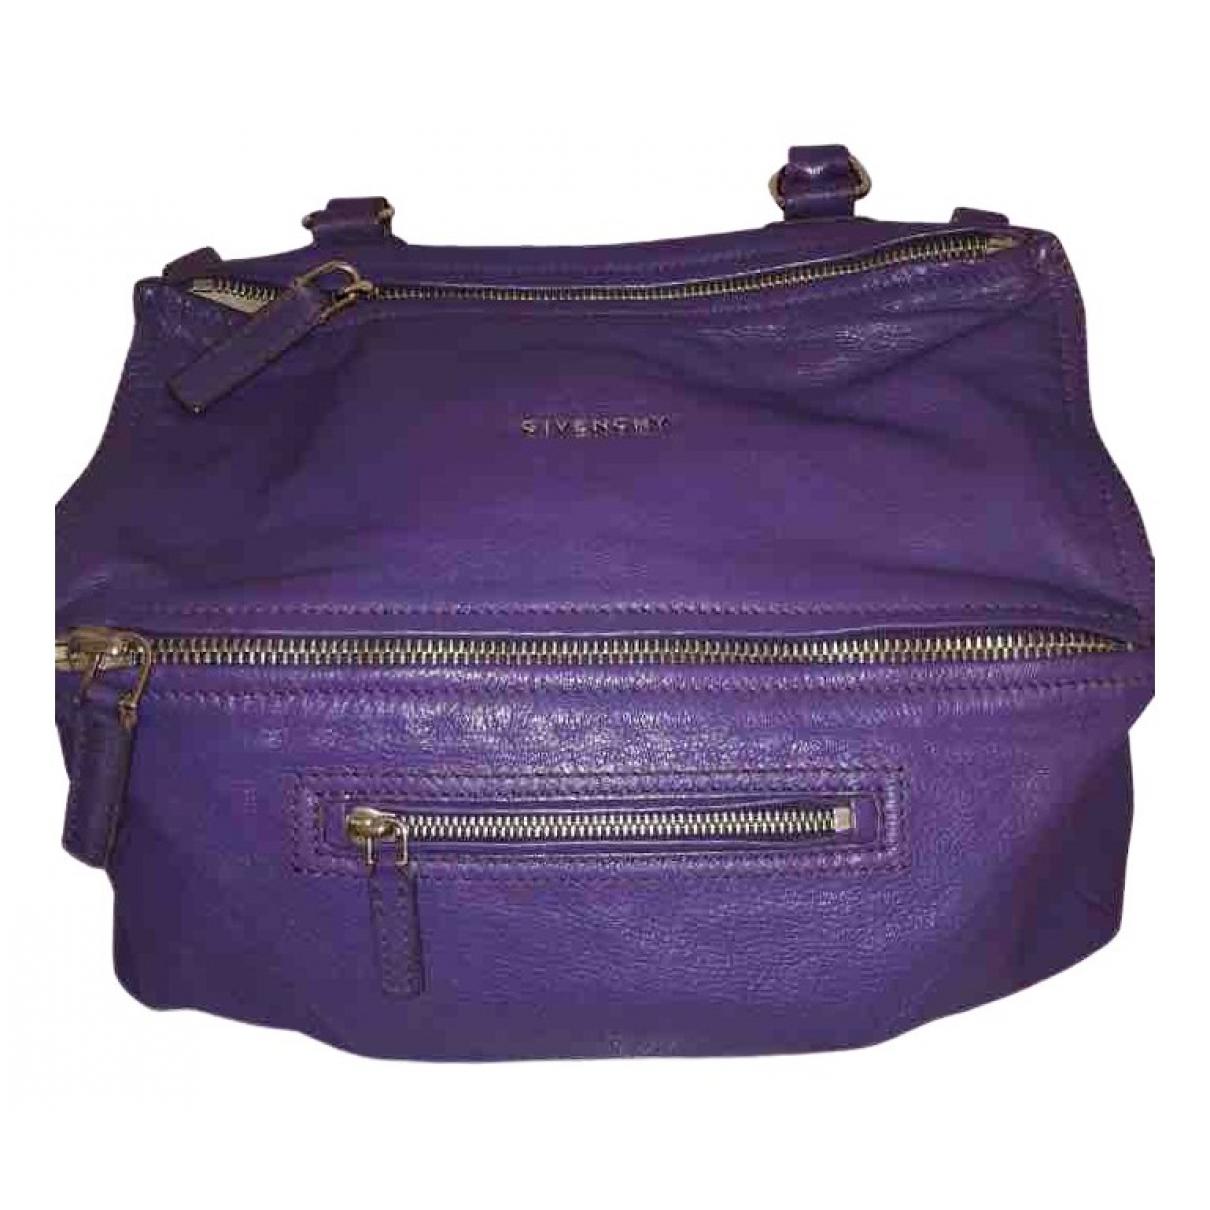 Givenchy Pandora Handtasche in  Lila Leder